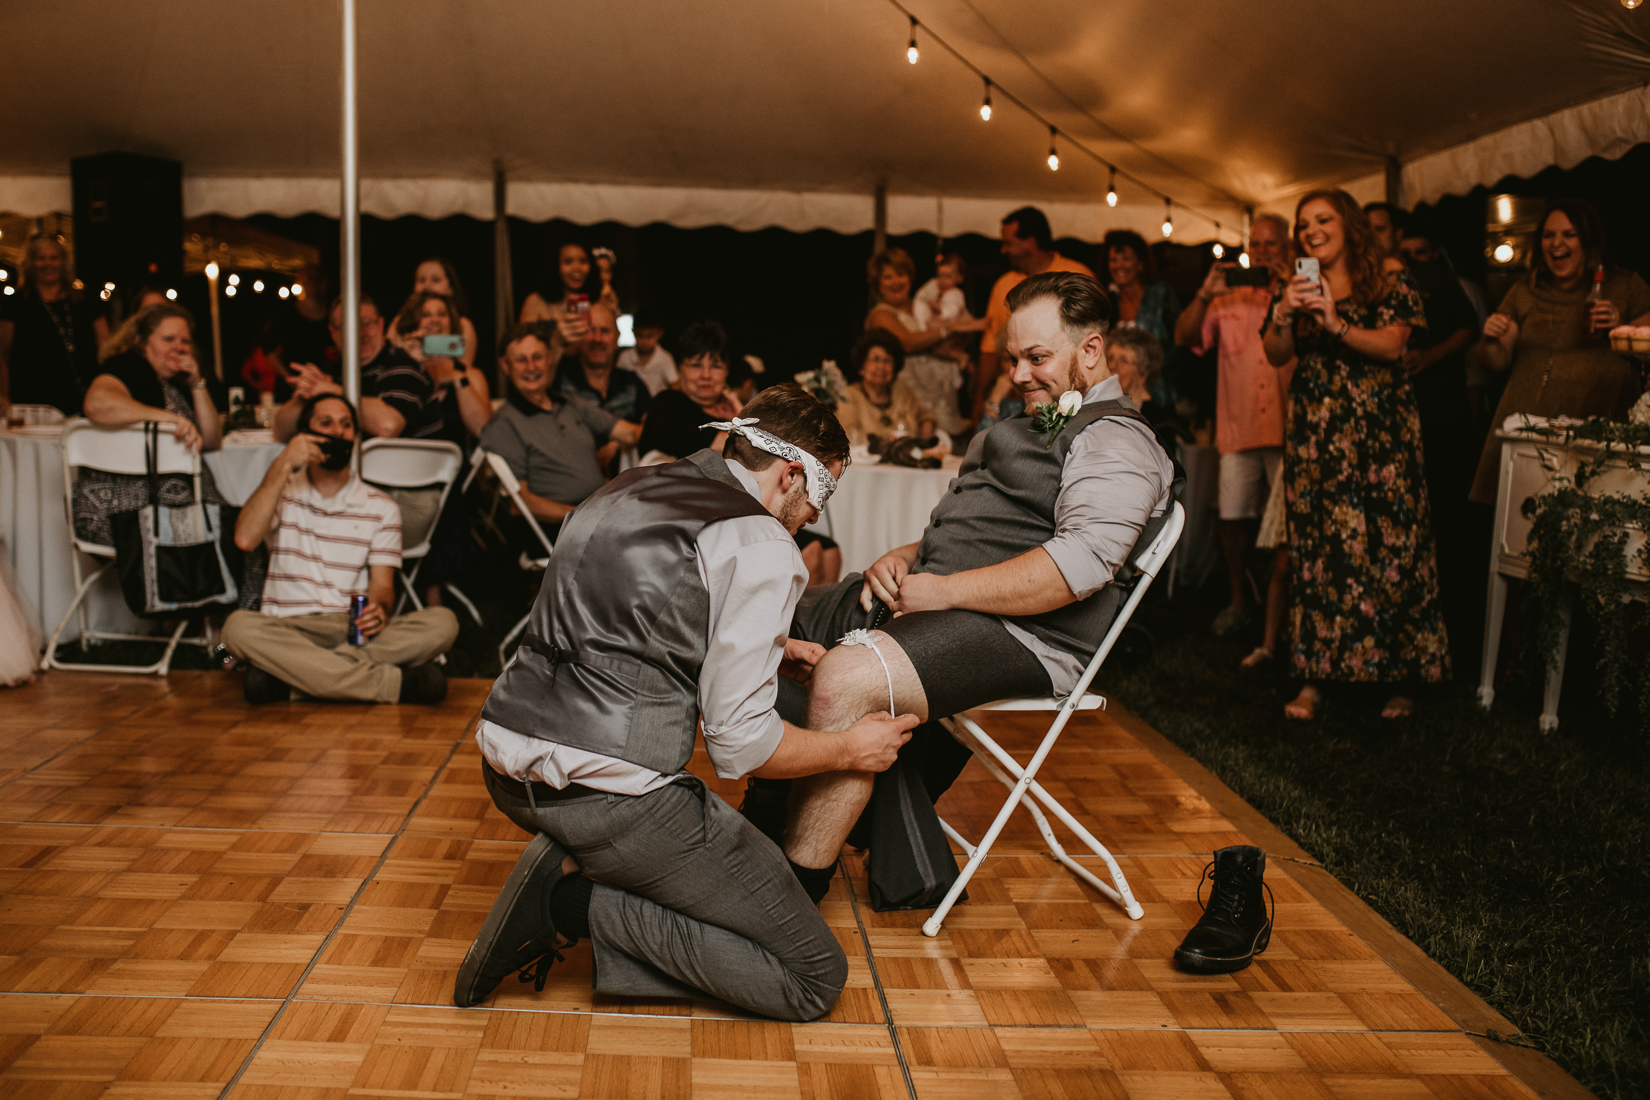 olivia_zay_wedding_09_2018-9106.jpg